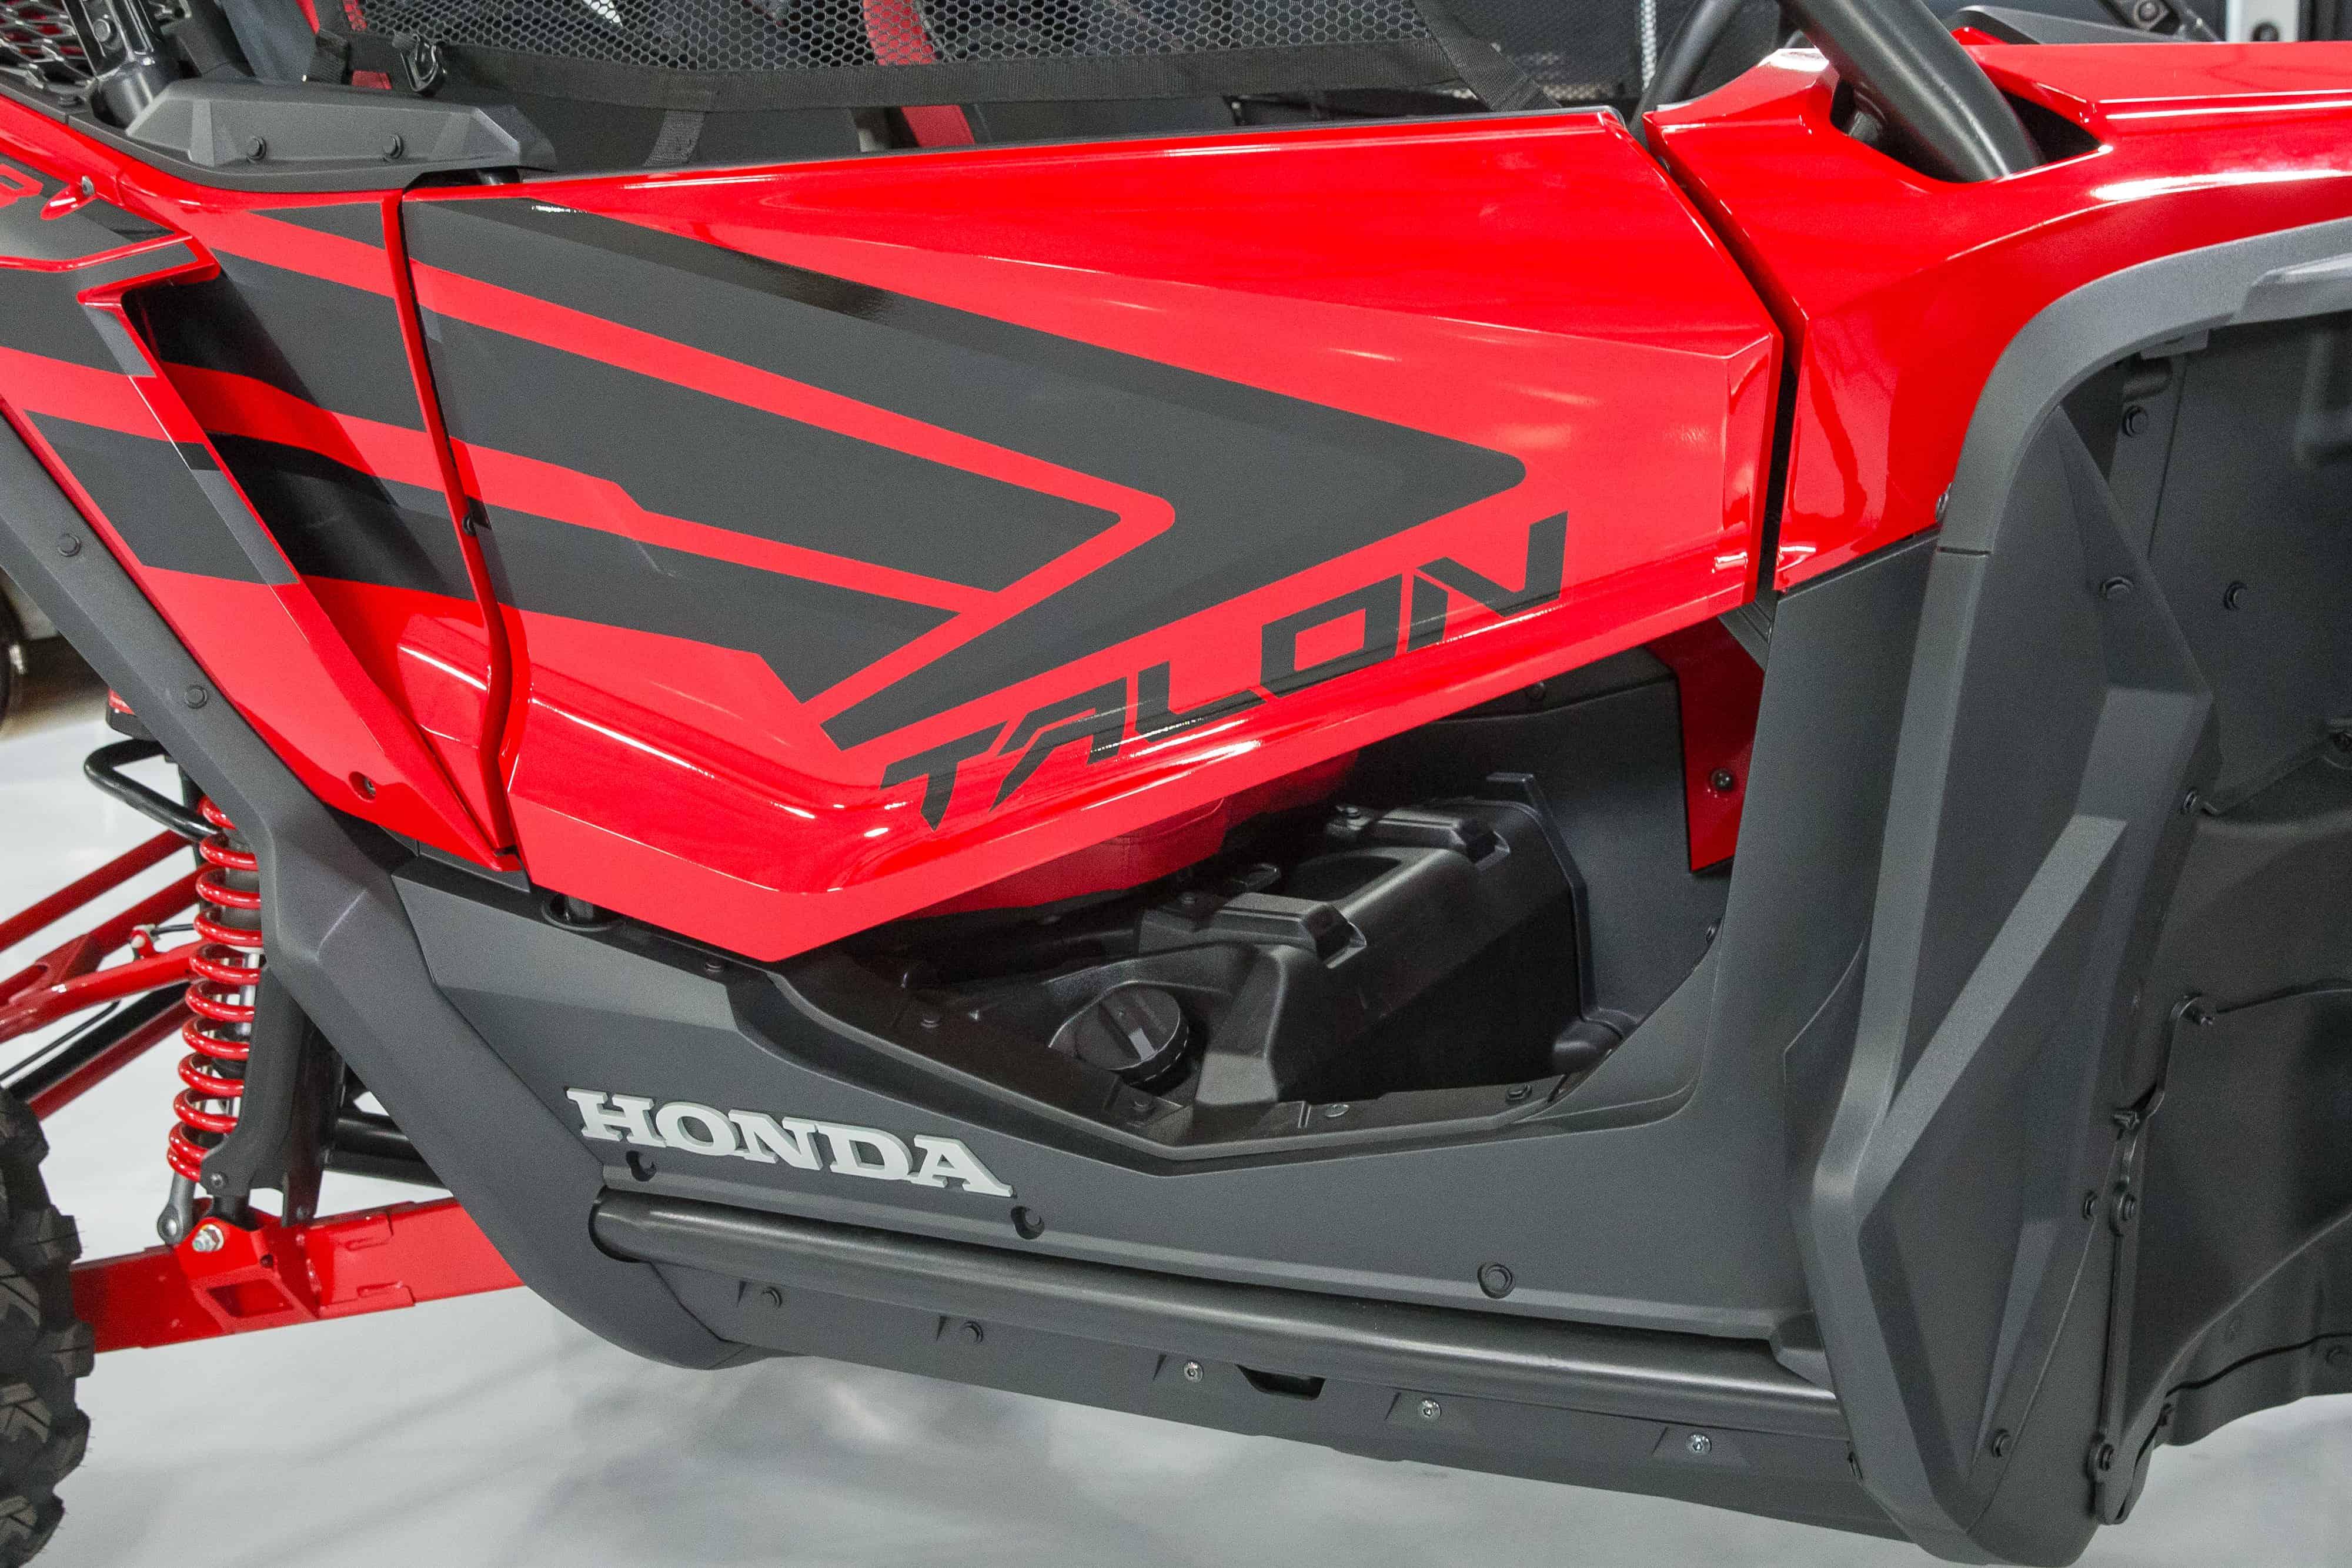 Honda Releases The All New Talon 1000r And 1000x Utv